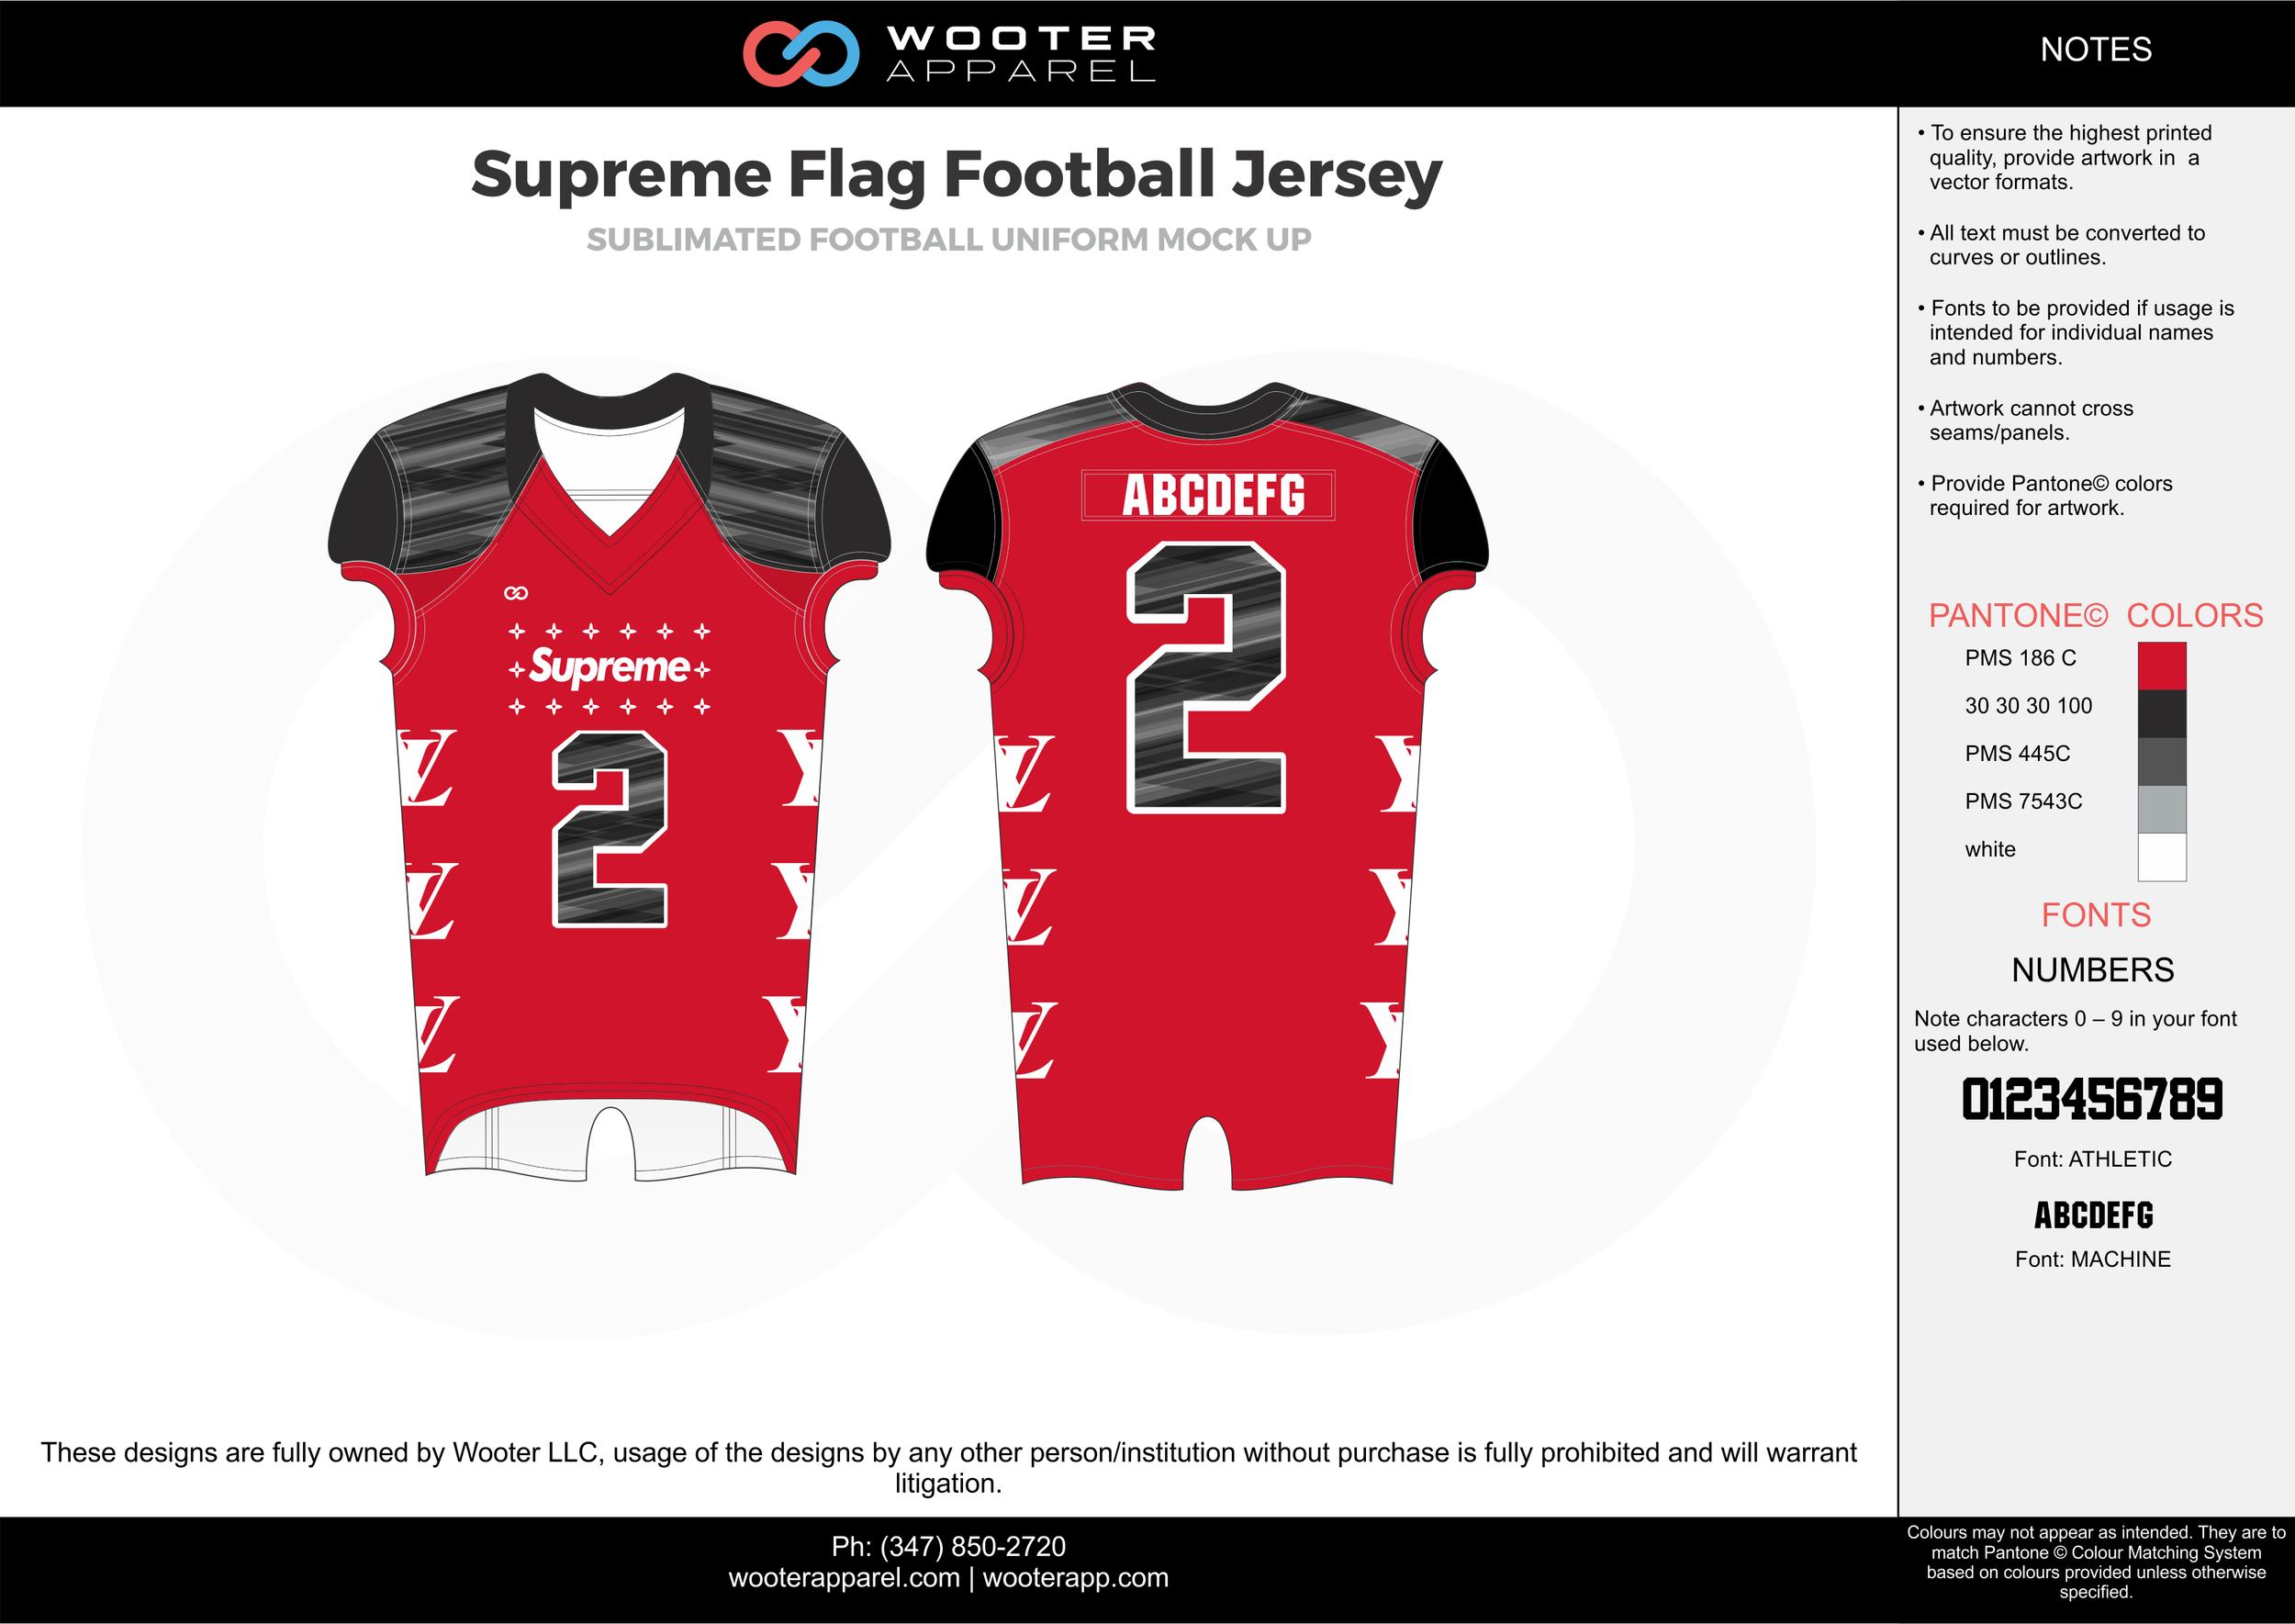 Supreme Flag red black grey white football uniforms jerseys top